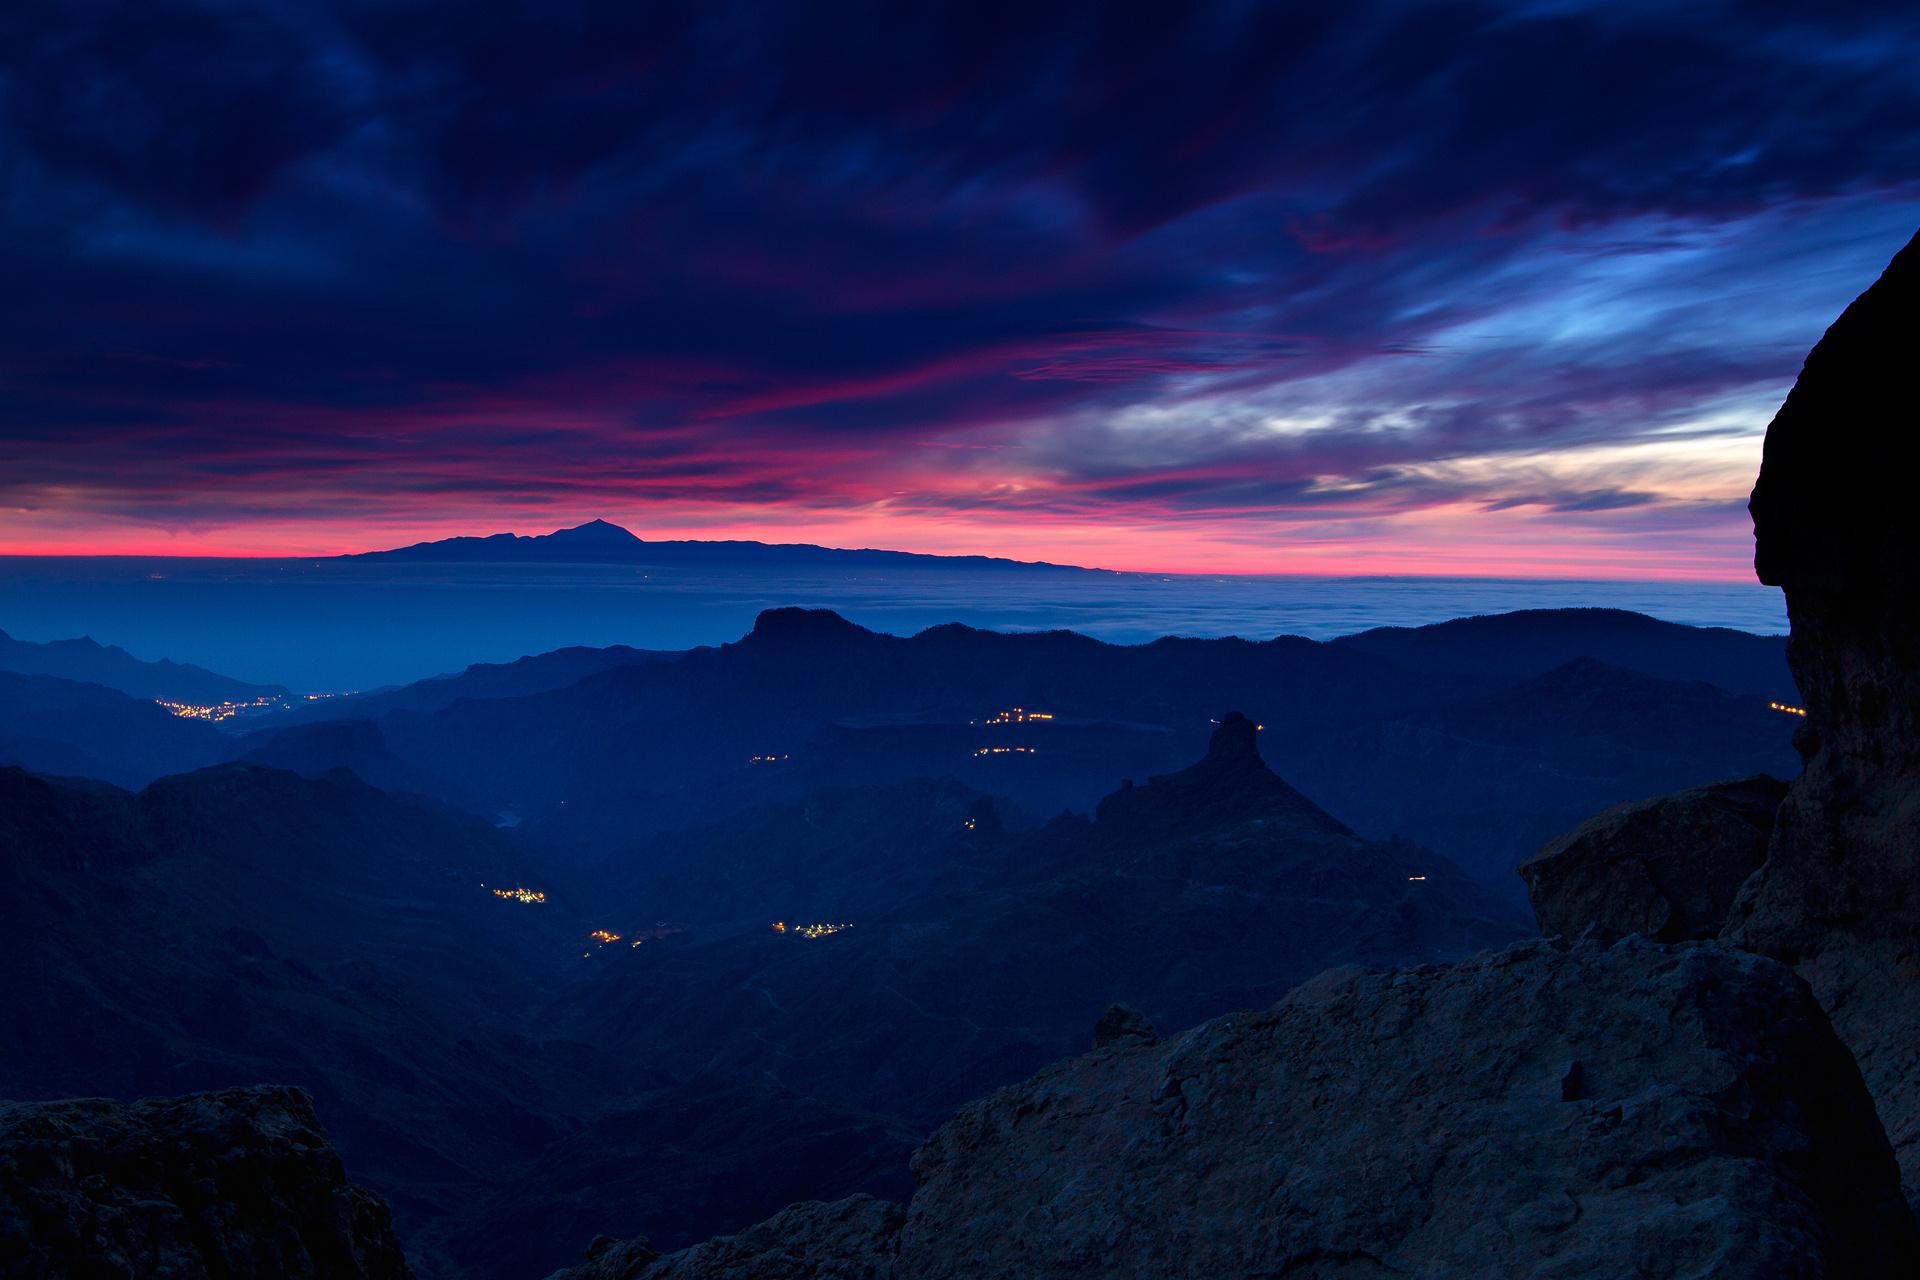 Landscape Mountain Scenic Panorama Night Light Sunset Sky Cloud 1920x1280